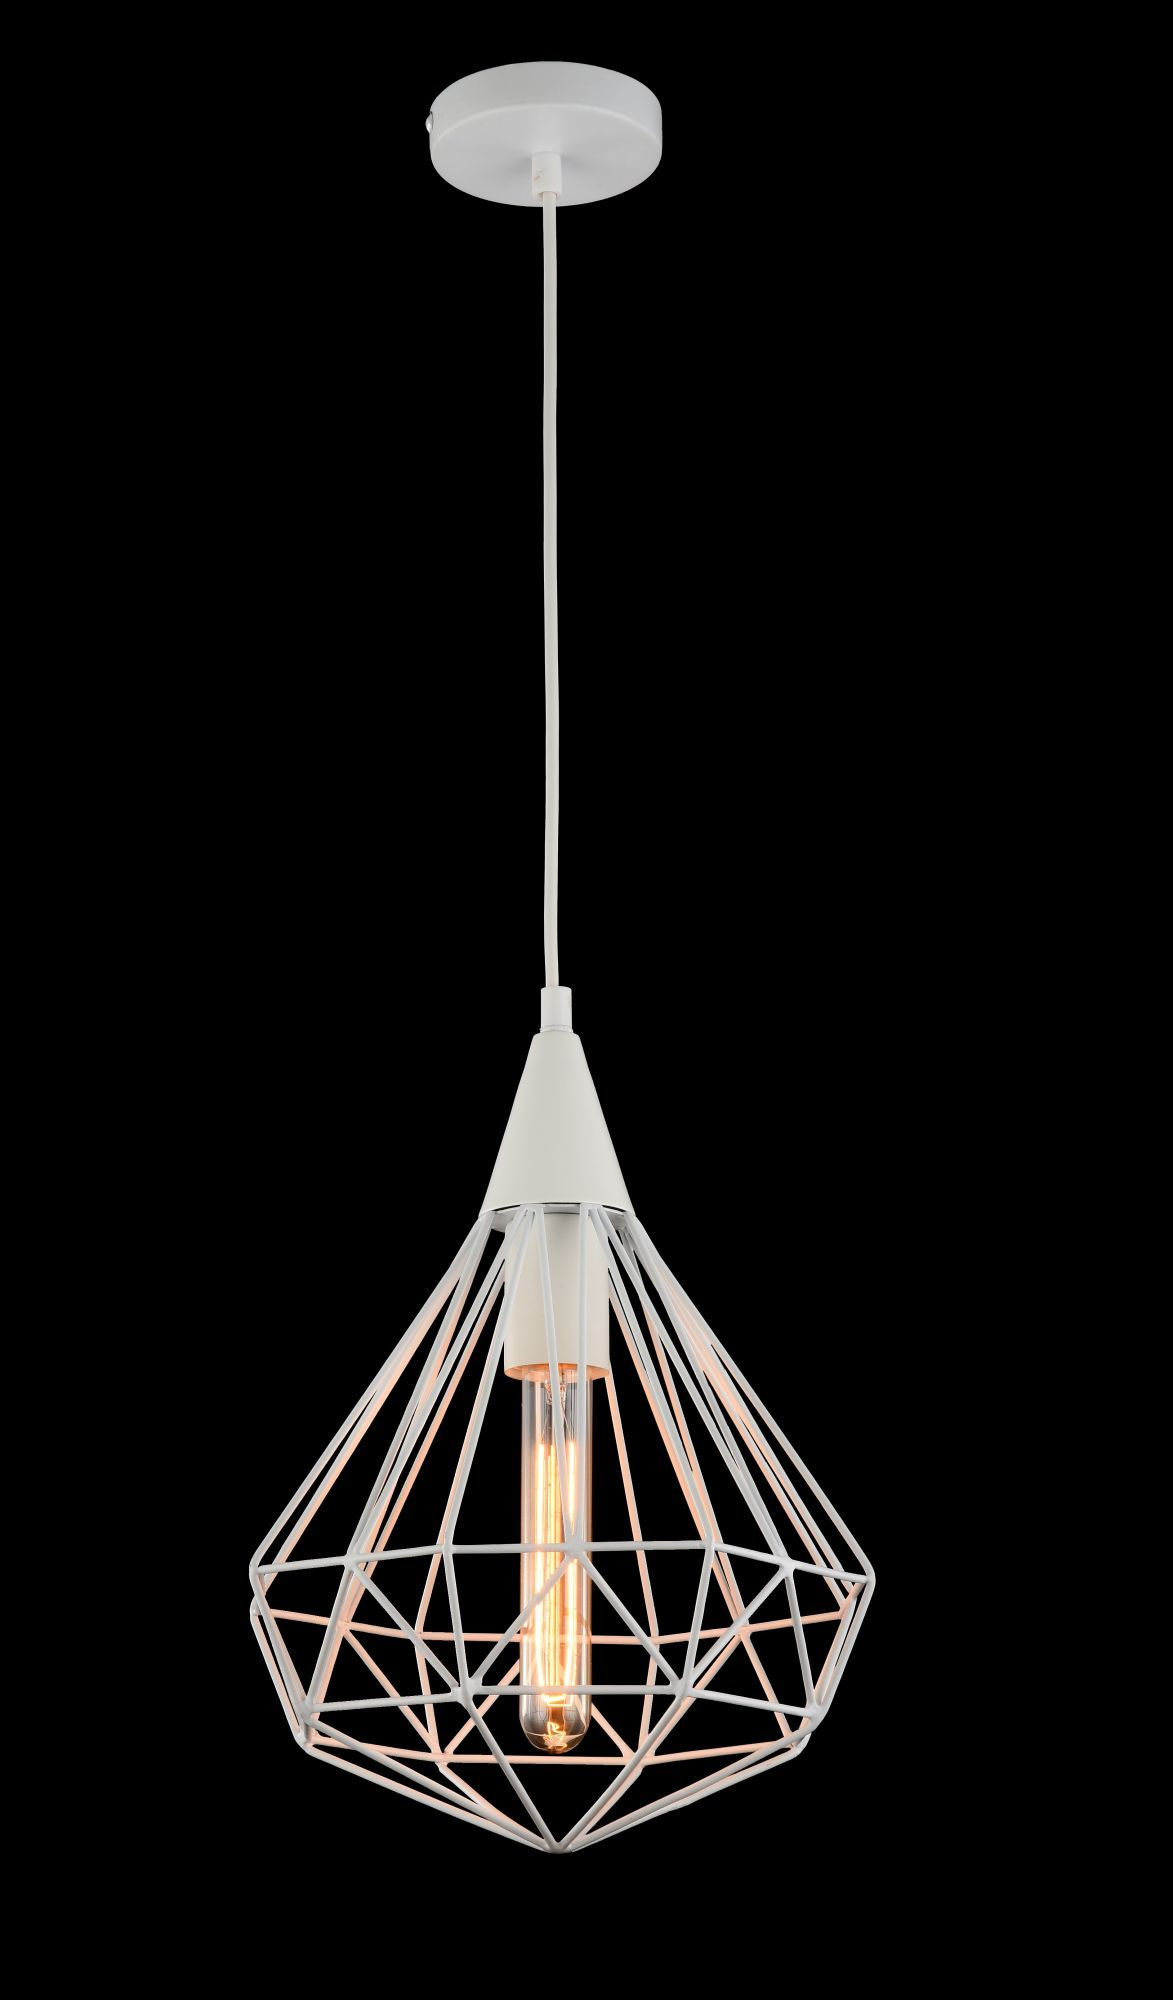 Подвесной светильник Maytoni Loft Calaf P360-PL-250-W (MOD360-01-W), 1xE27x60W, белый, металл - фото 3